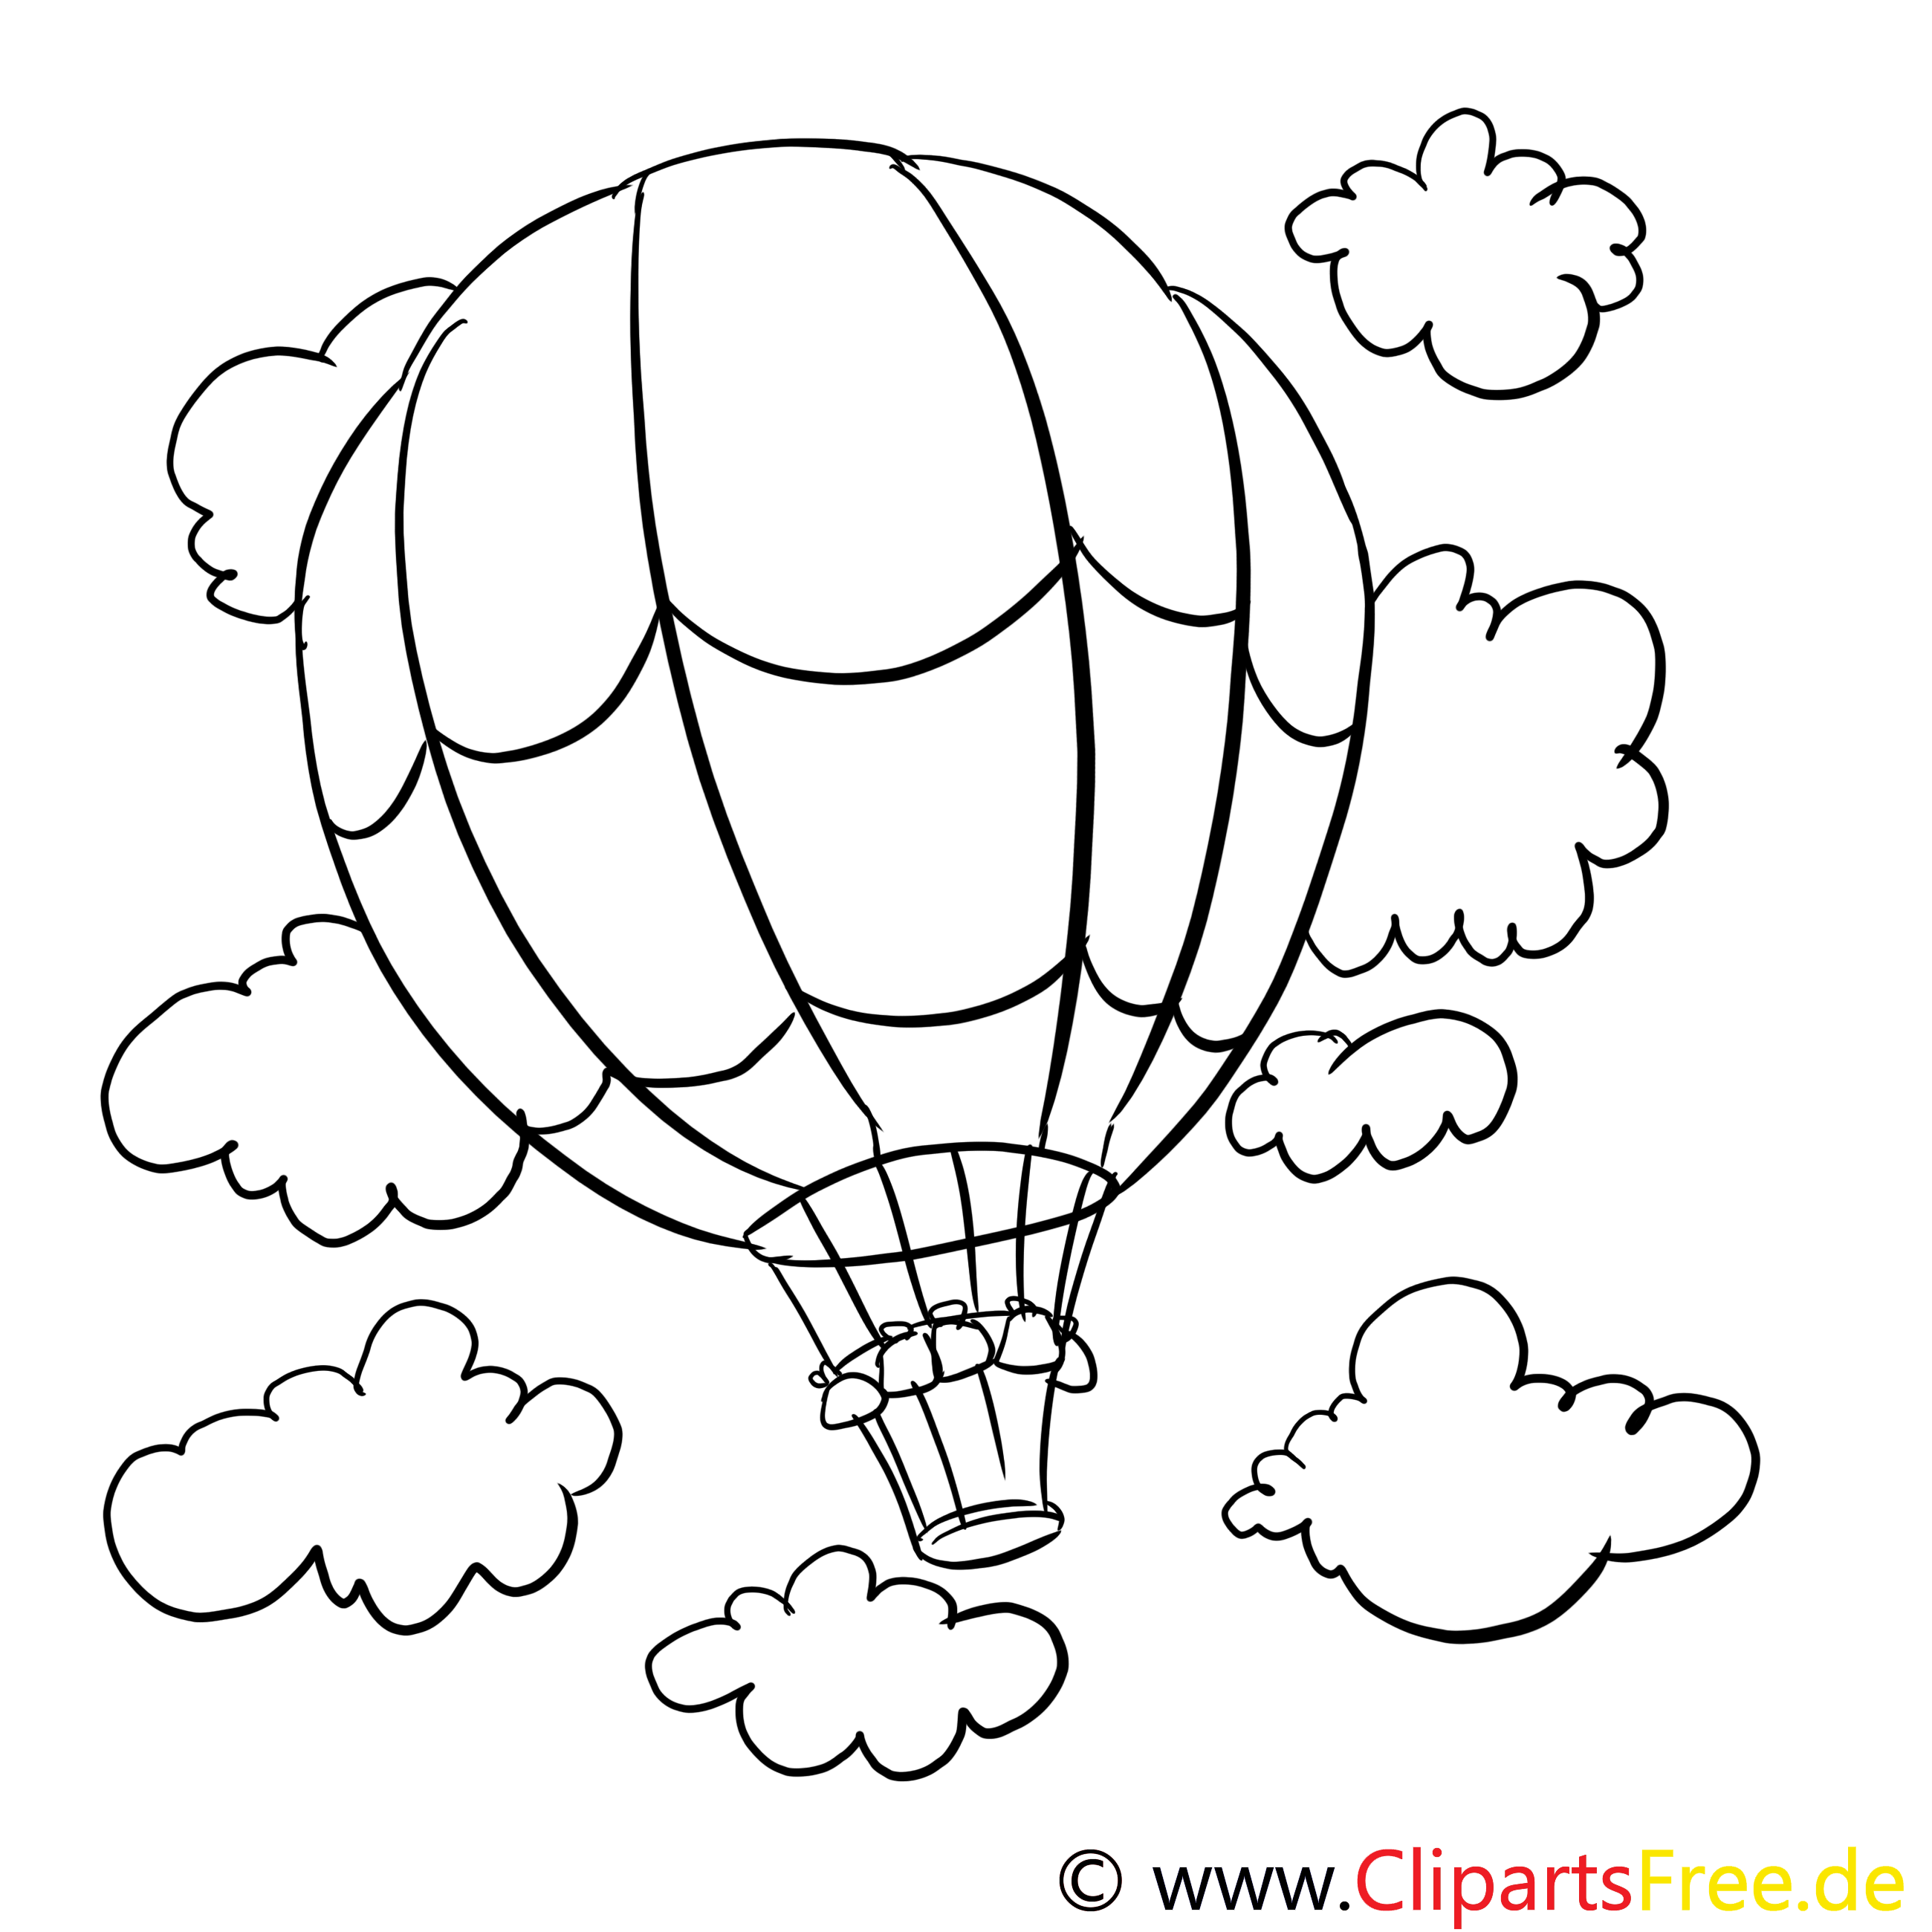 ausmalvorlage heißluftballon